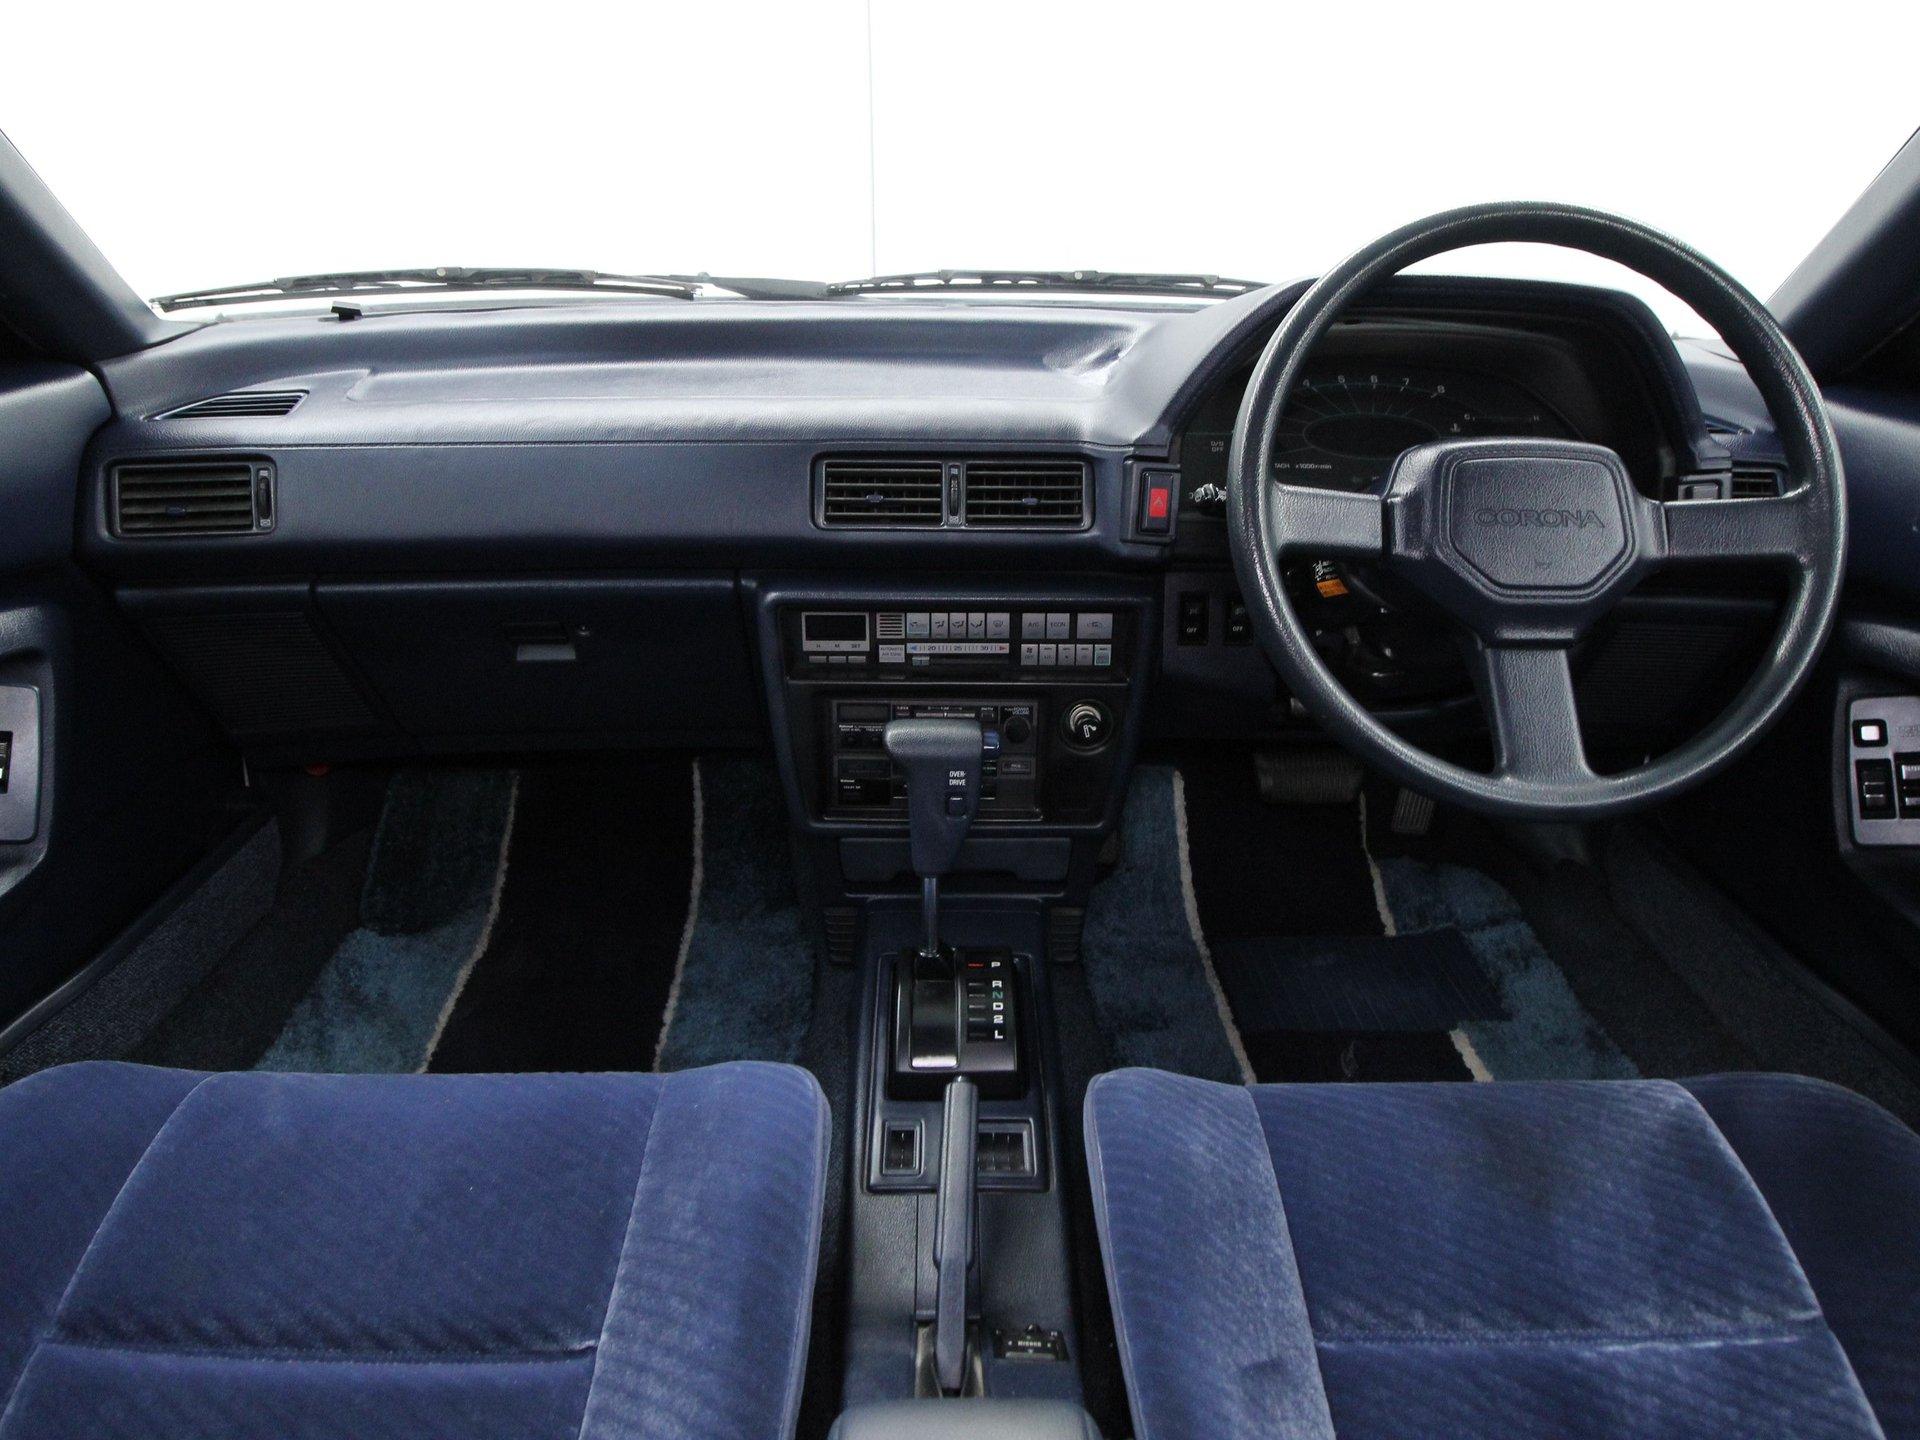 1986 Toyota Corona